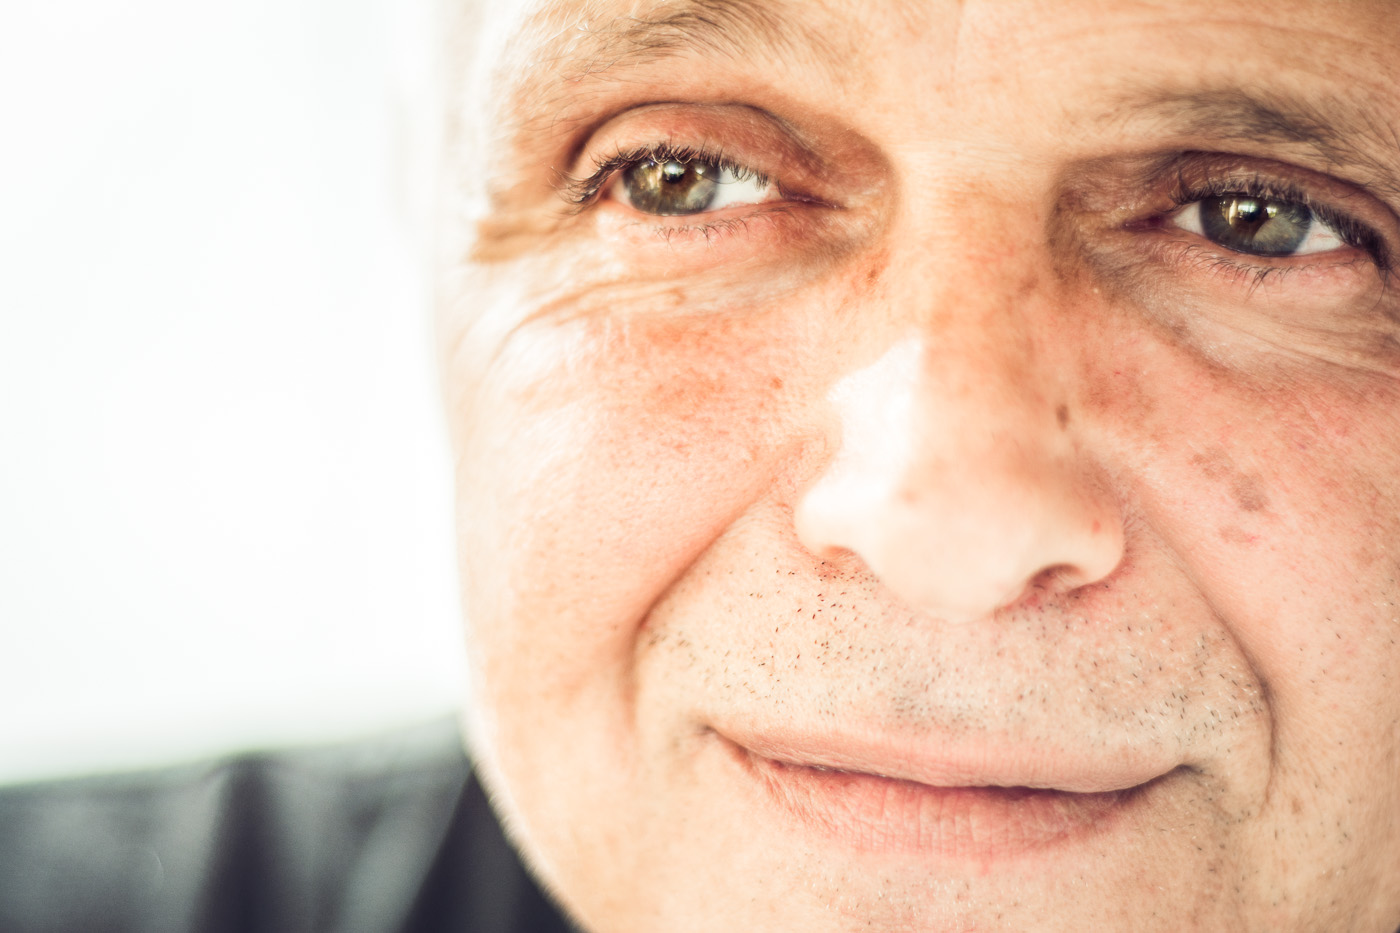 Cohen Sep2013 ItaiAviran (web-small) 201.jpg